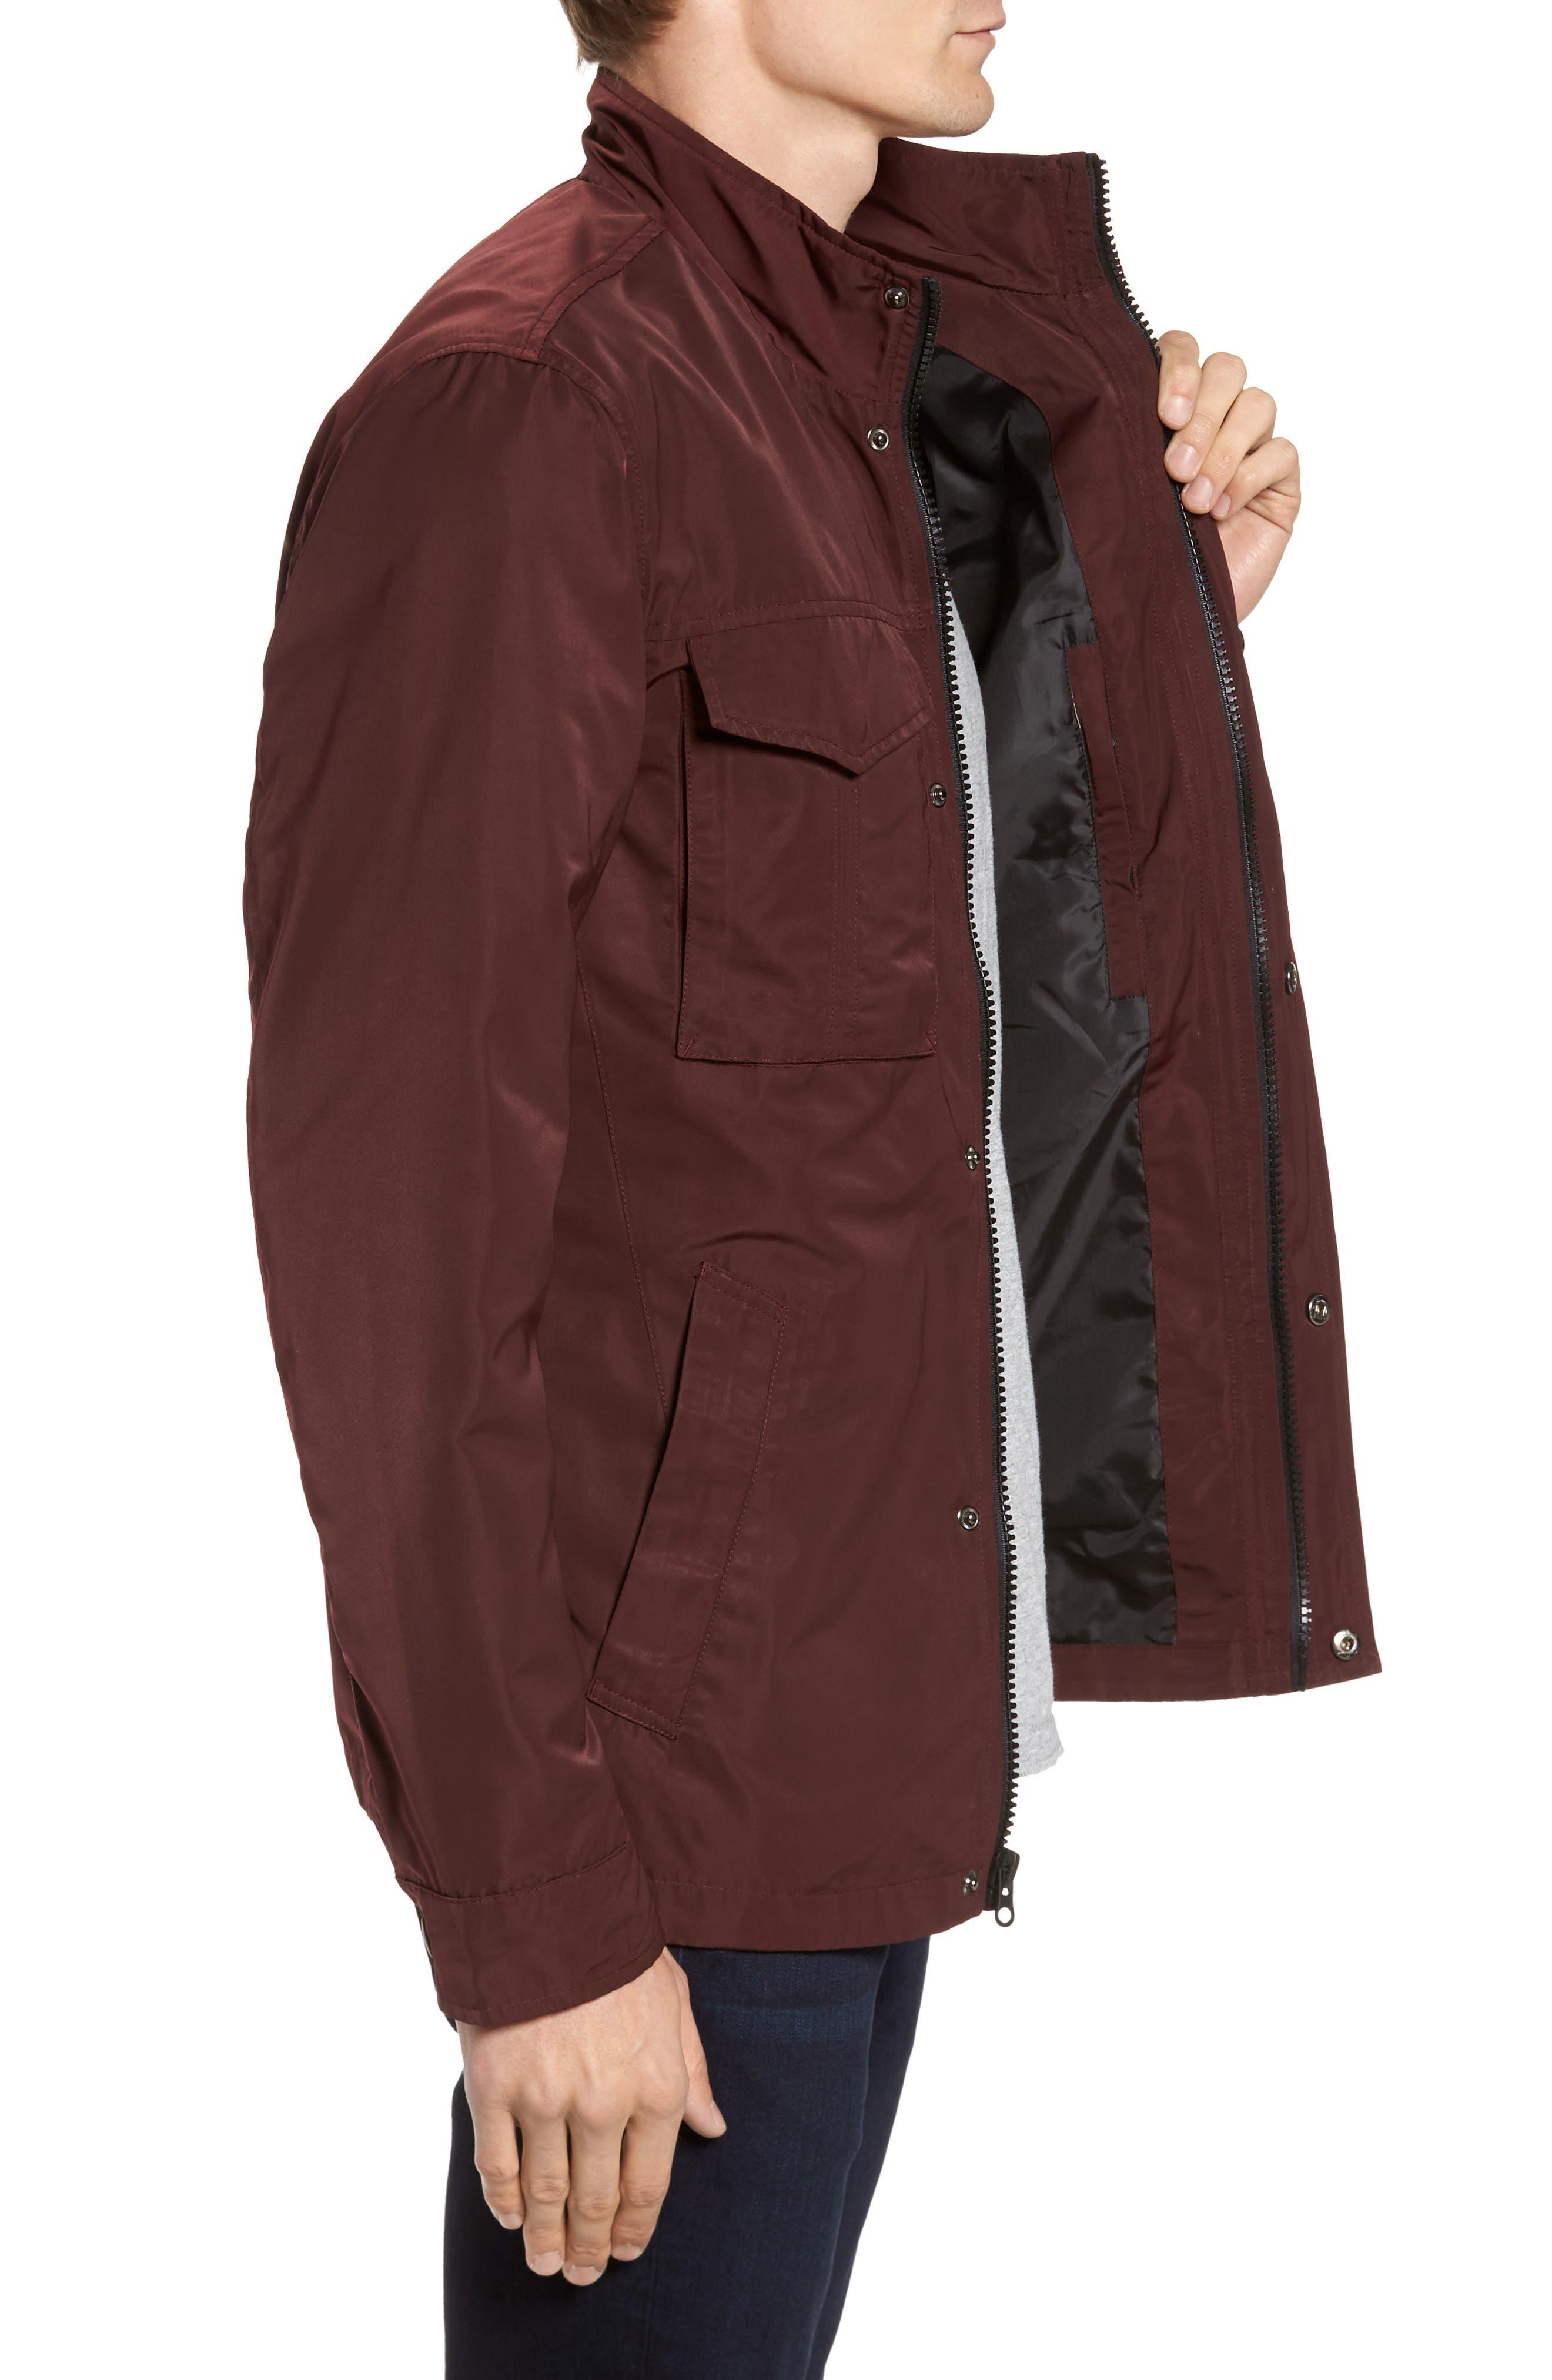 Dougie Waterproof Jacket,                             Alternate thumbnail 6, color,